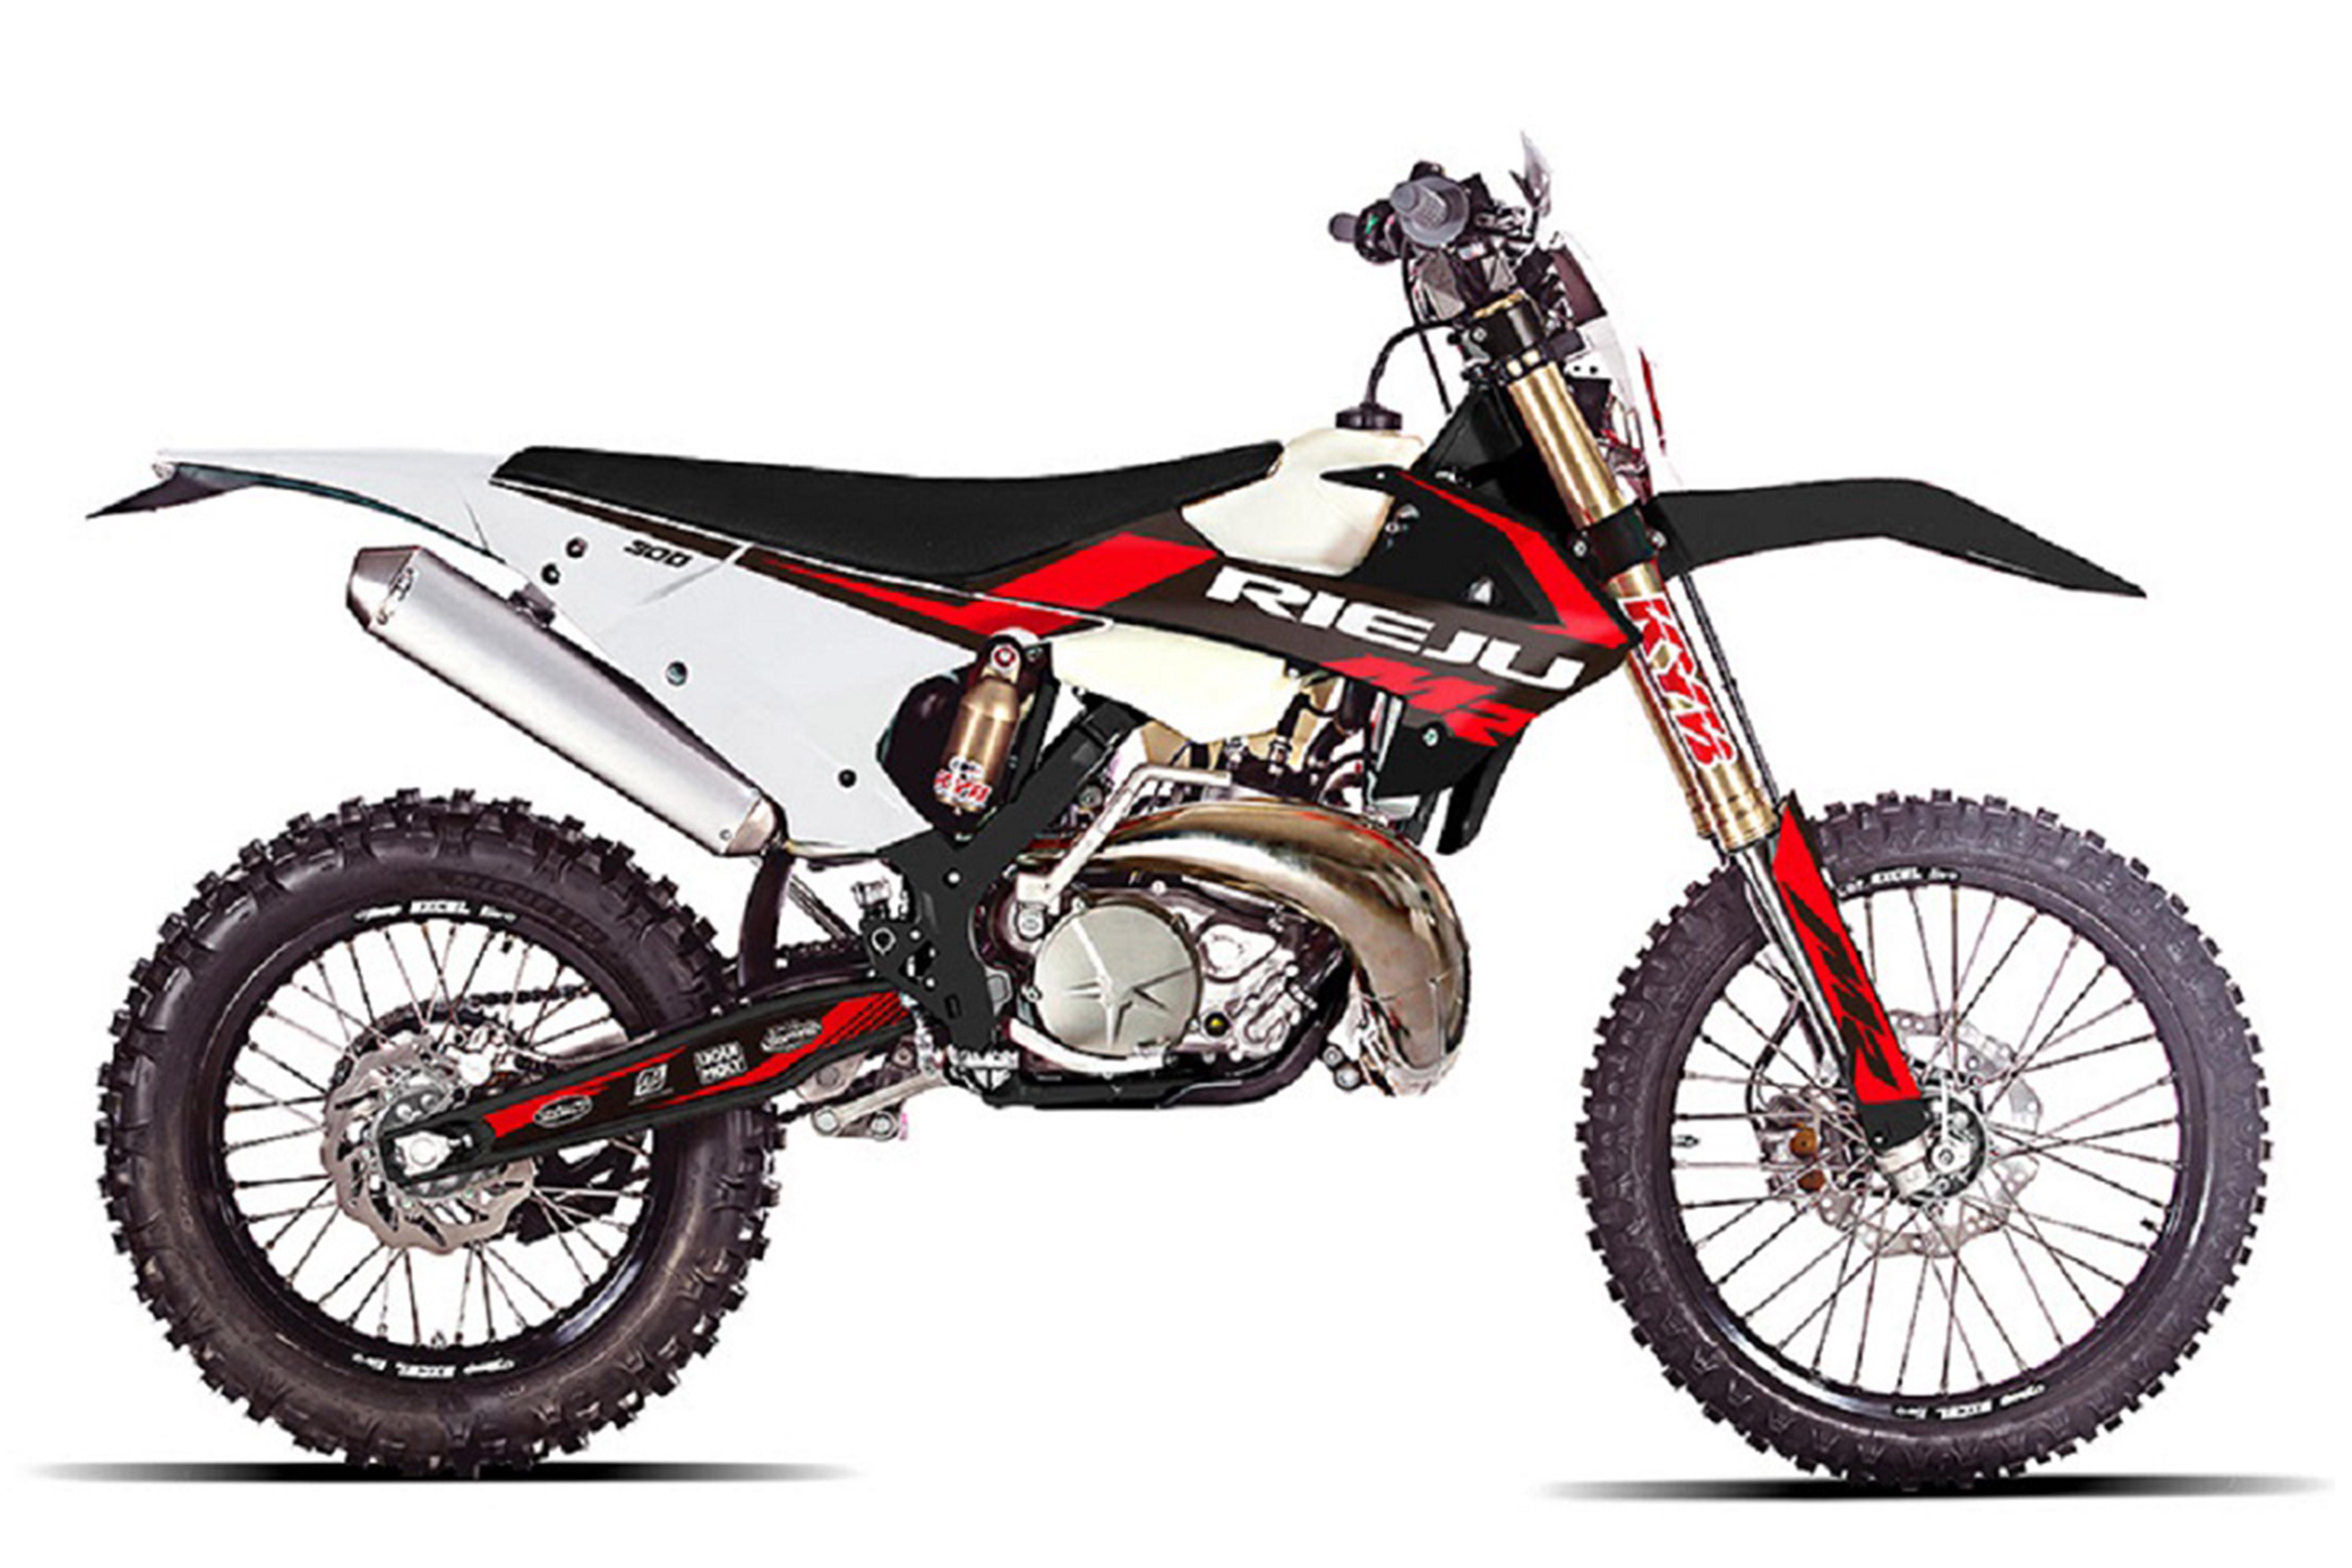 Precios del Rieju MR Racing 300